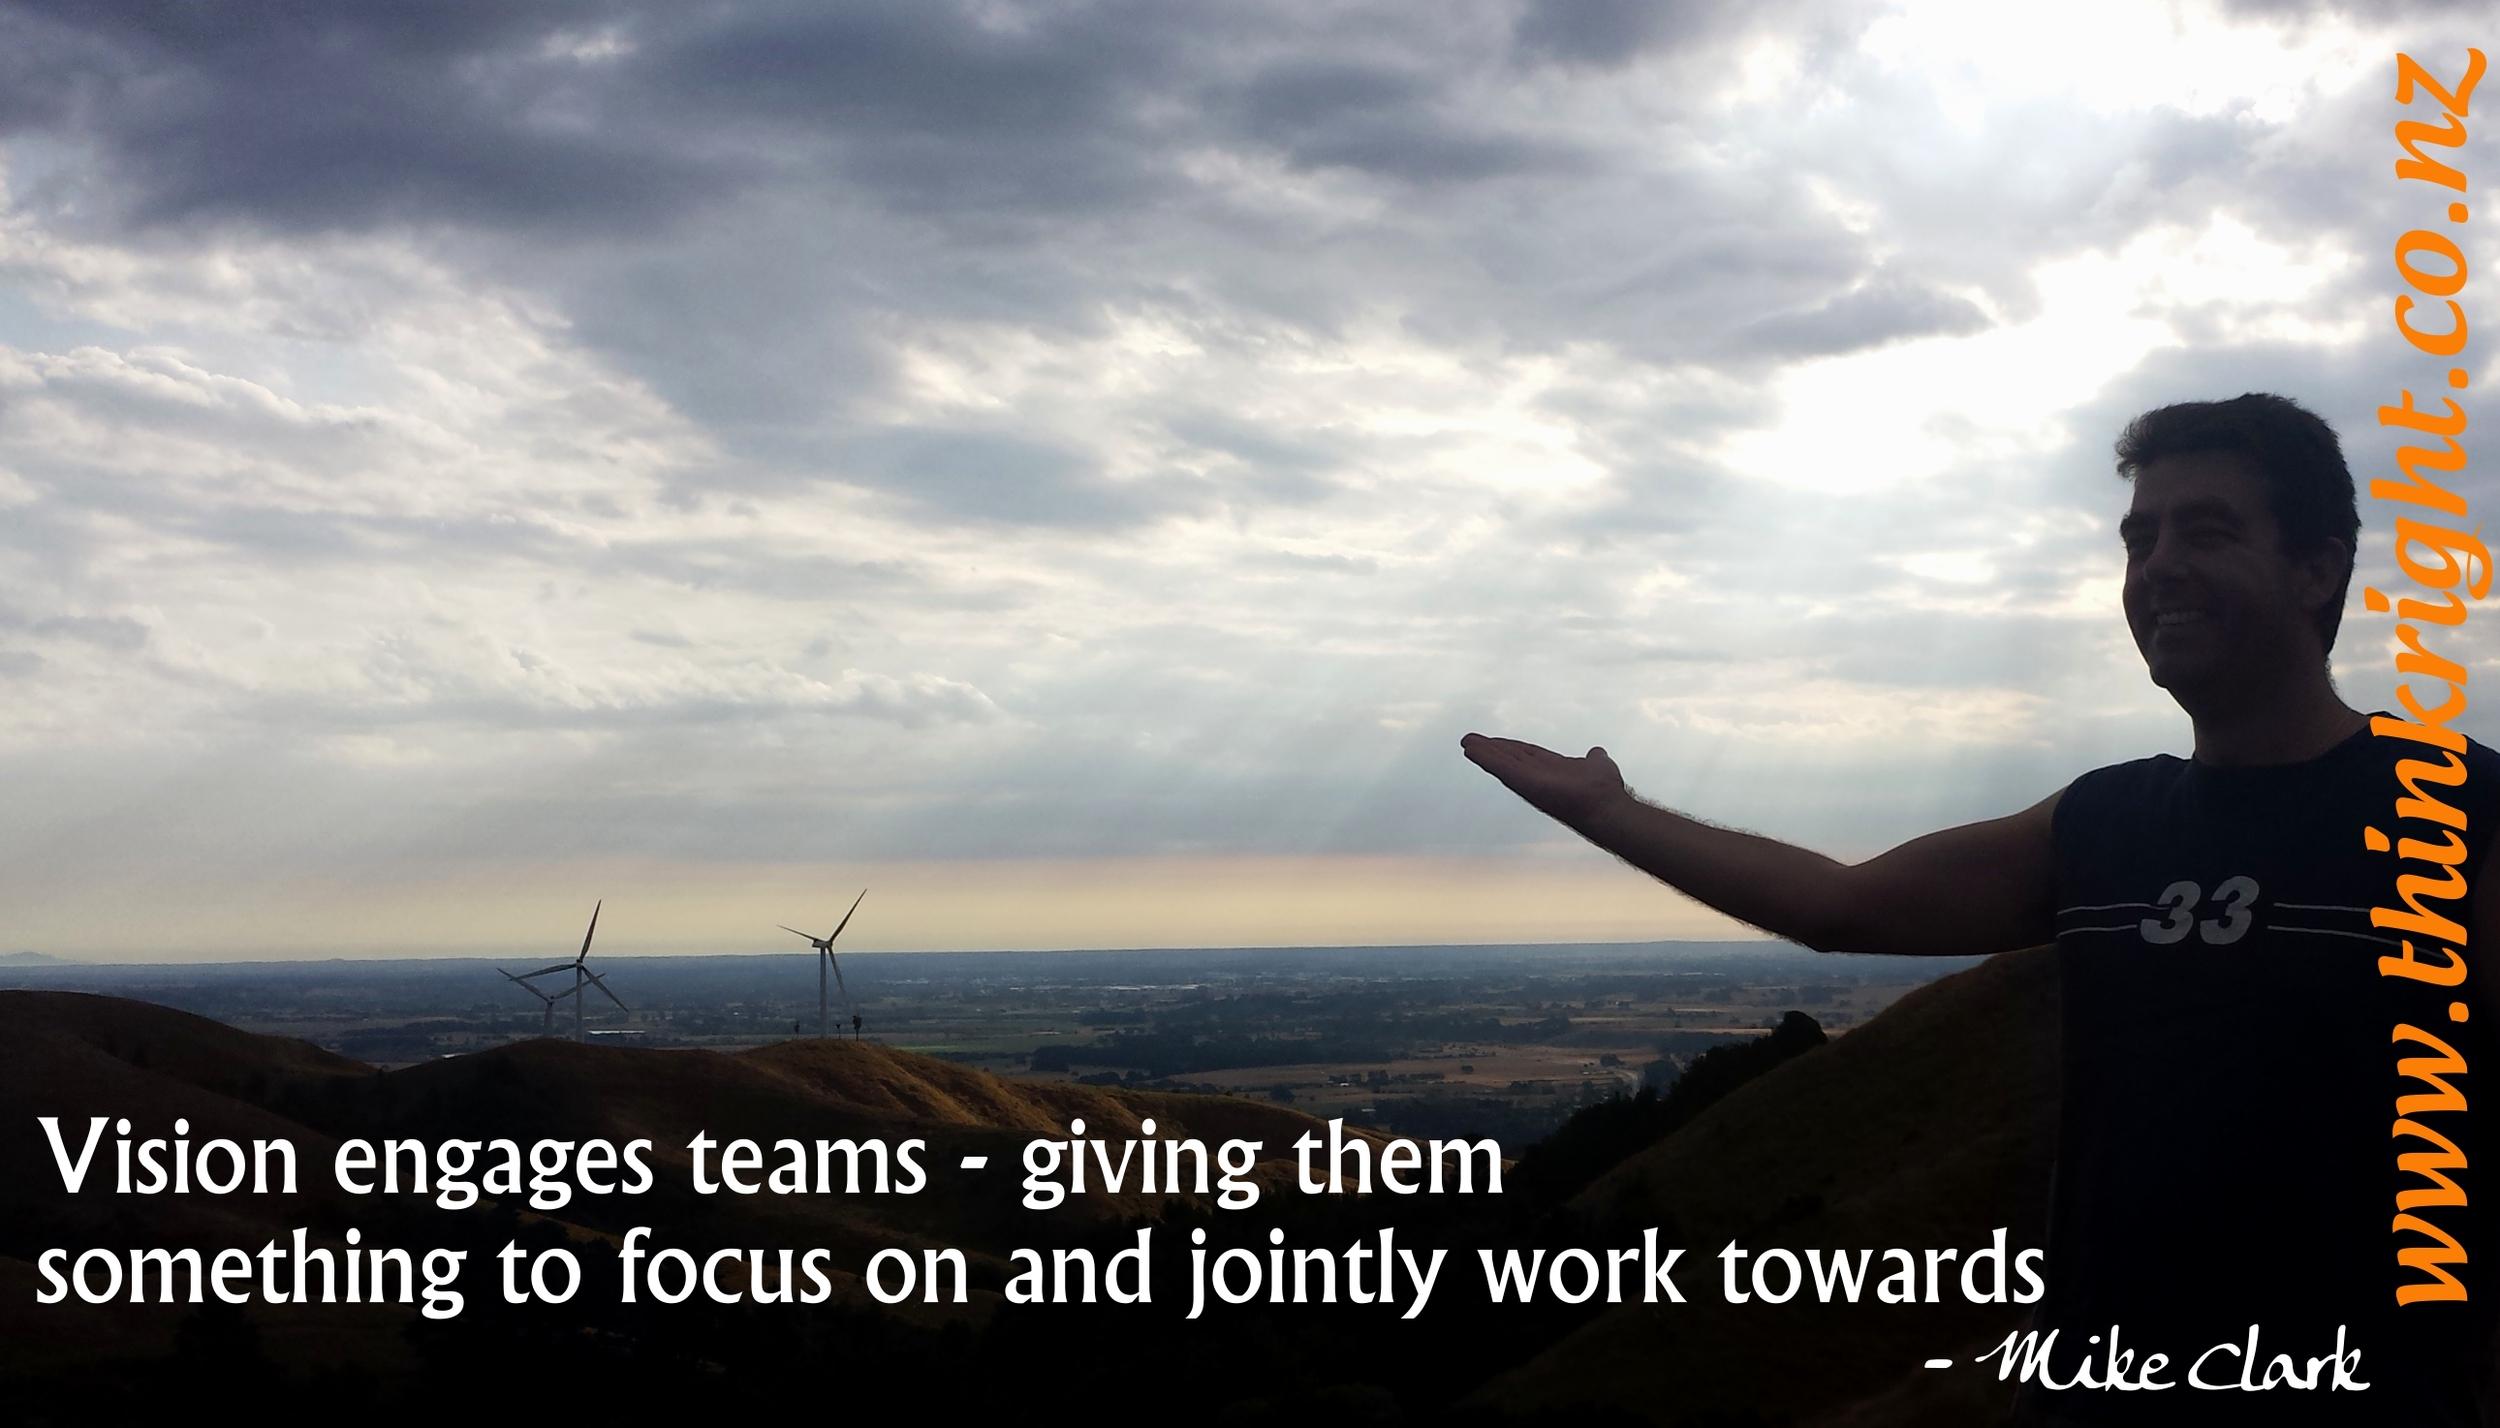 Mindset of high performance teams